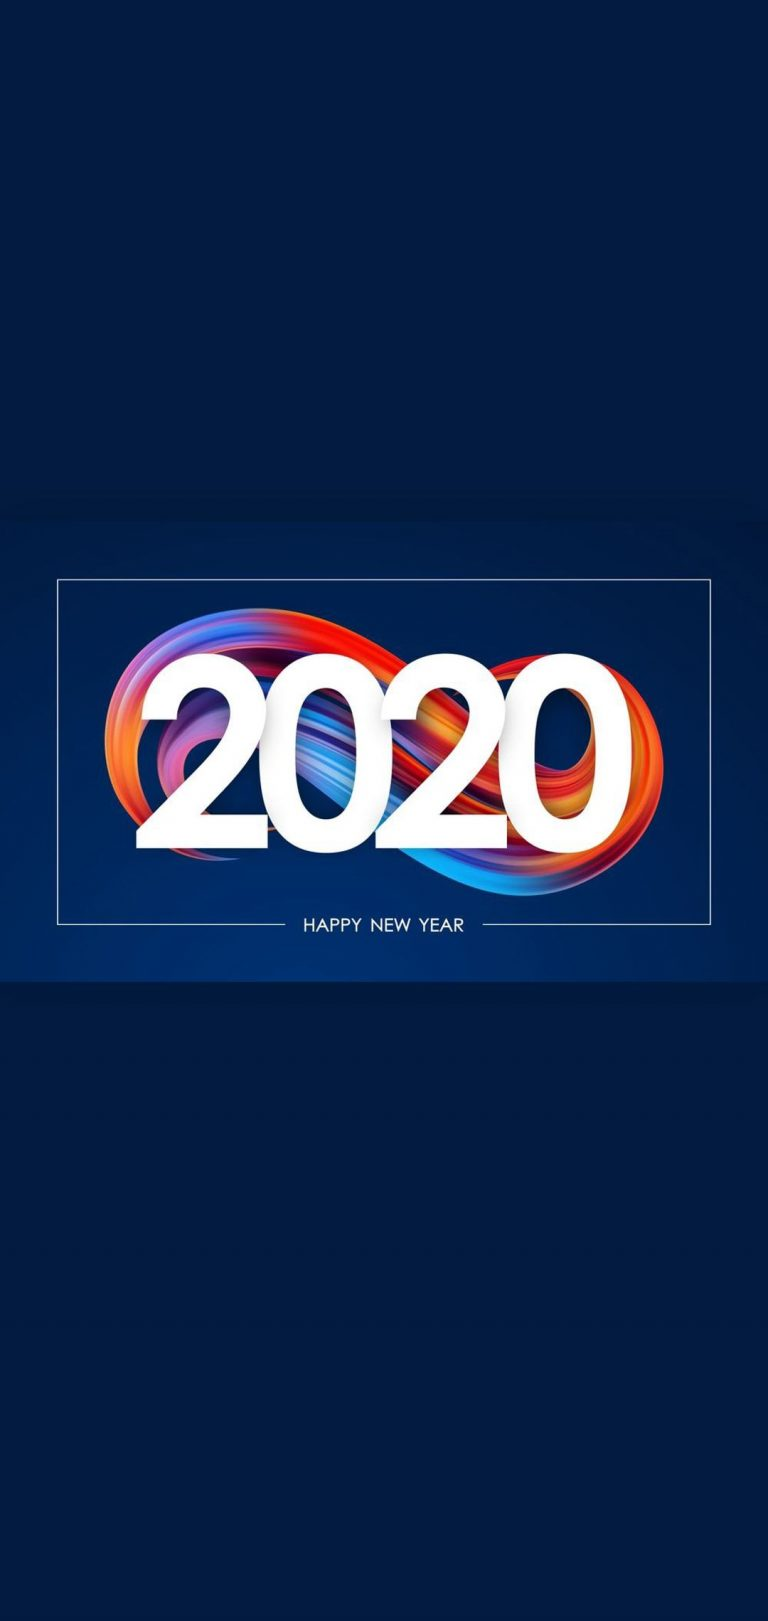 Happy New Year 2020 Phone Wallpaper 25 - [1080x2280]